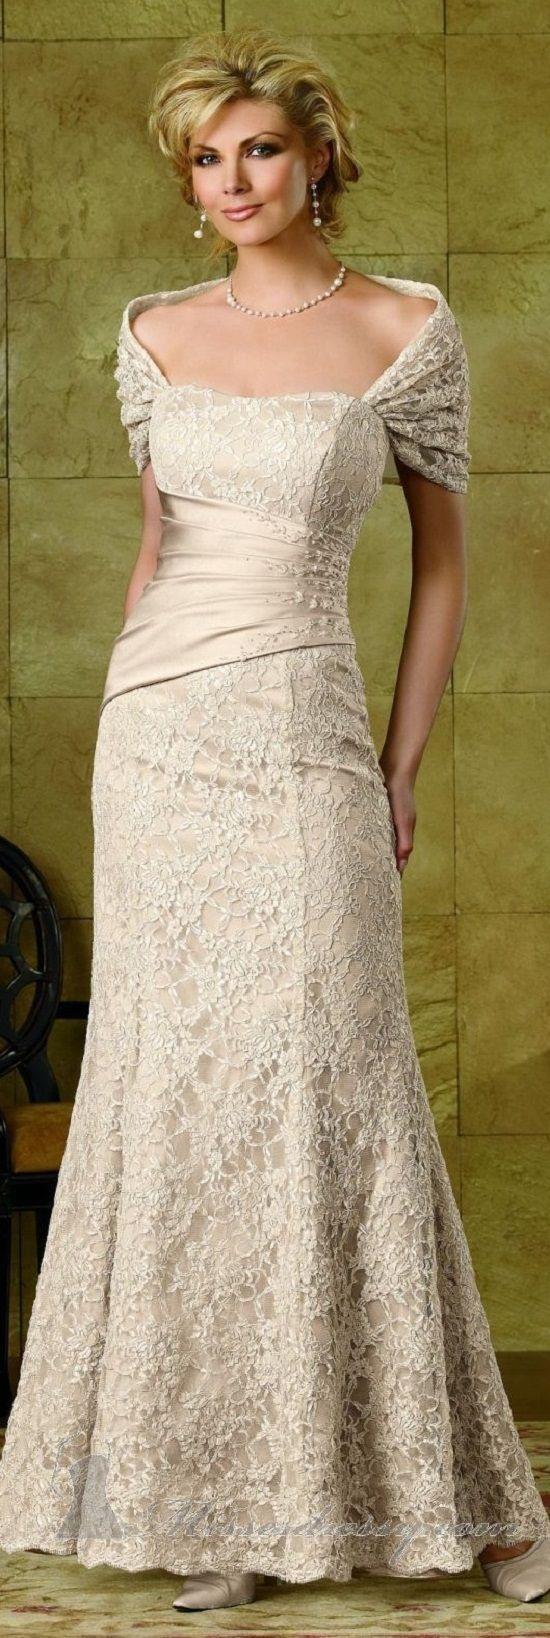 wedding gowns for older brides over 40 Second wedding